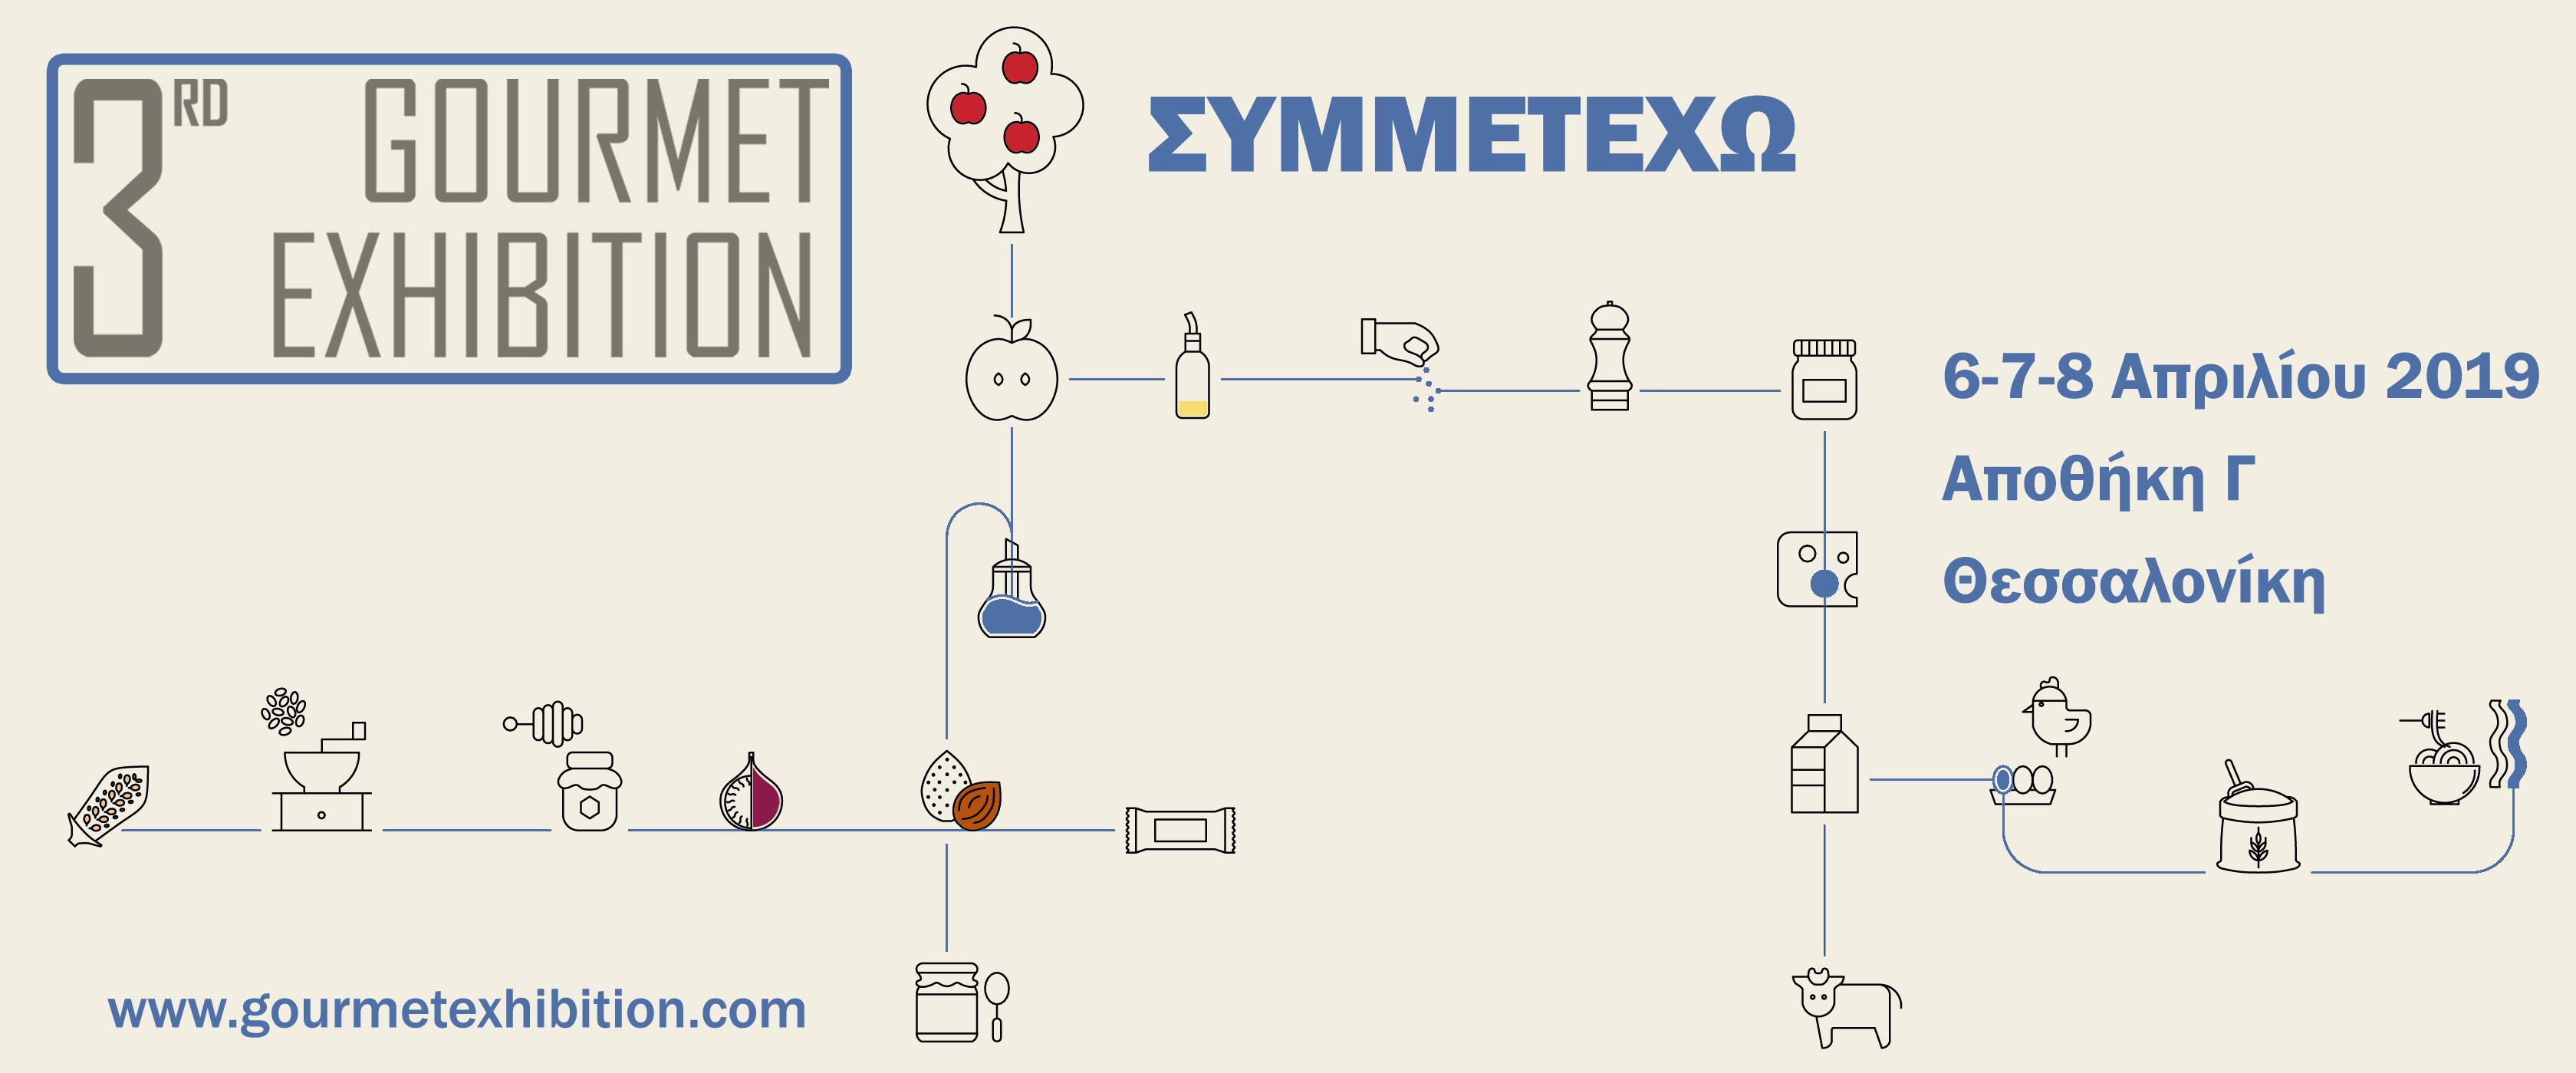 3rd Gourmet Exhibition | 48 εκδηλώσεις στη 'Gourmet Exhibition' που αναδεικνύουν τα ελληνικά προϊόντα!